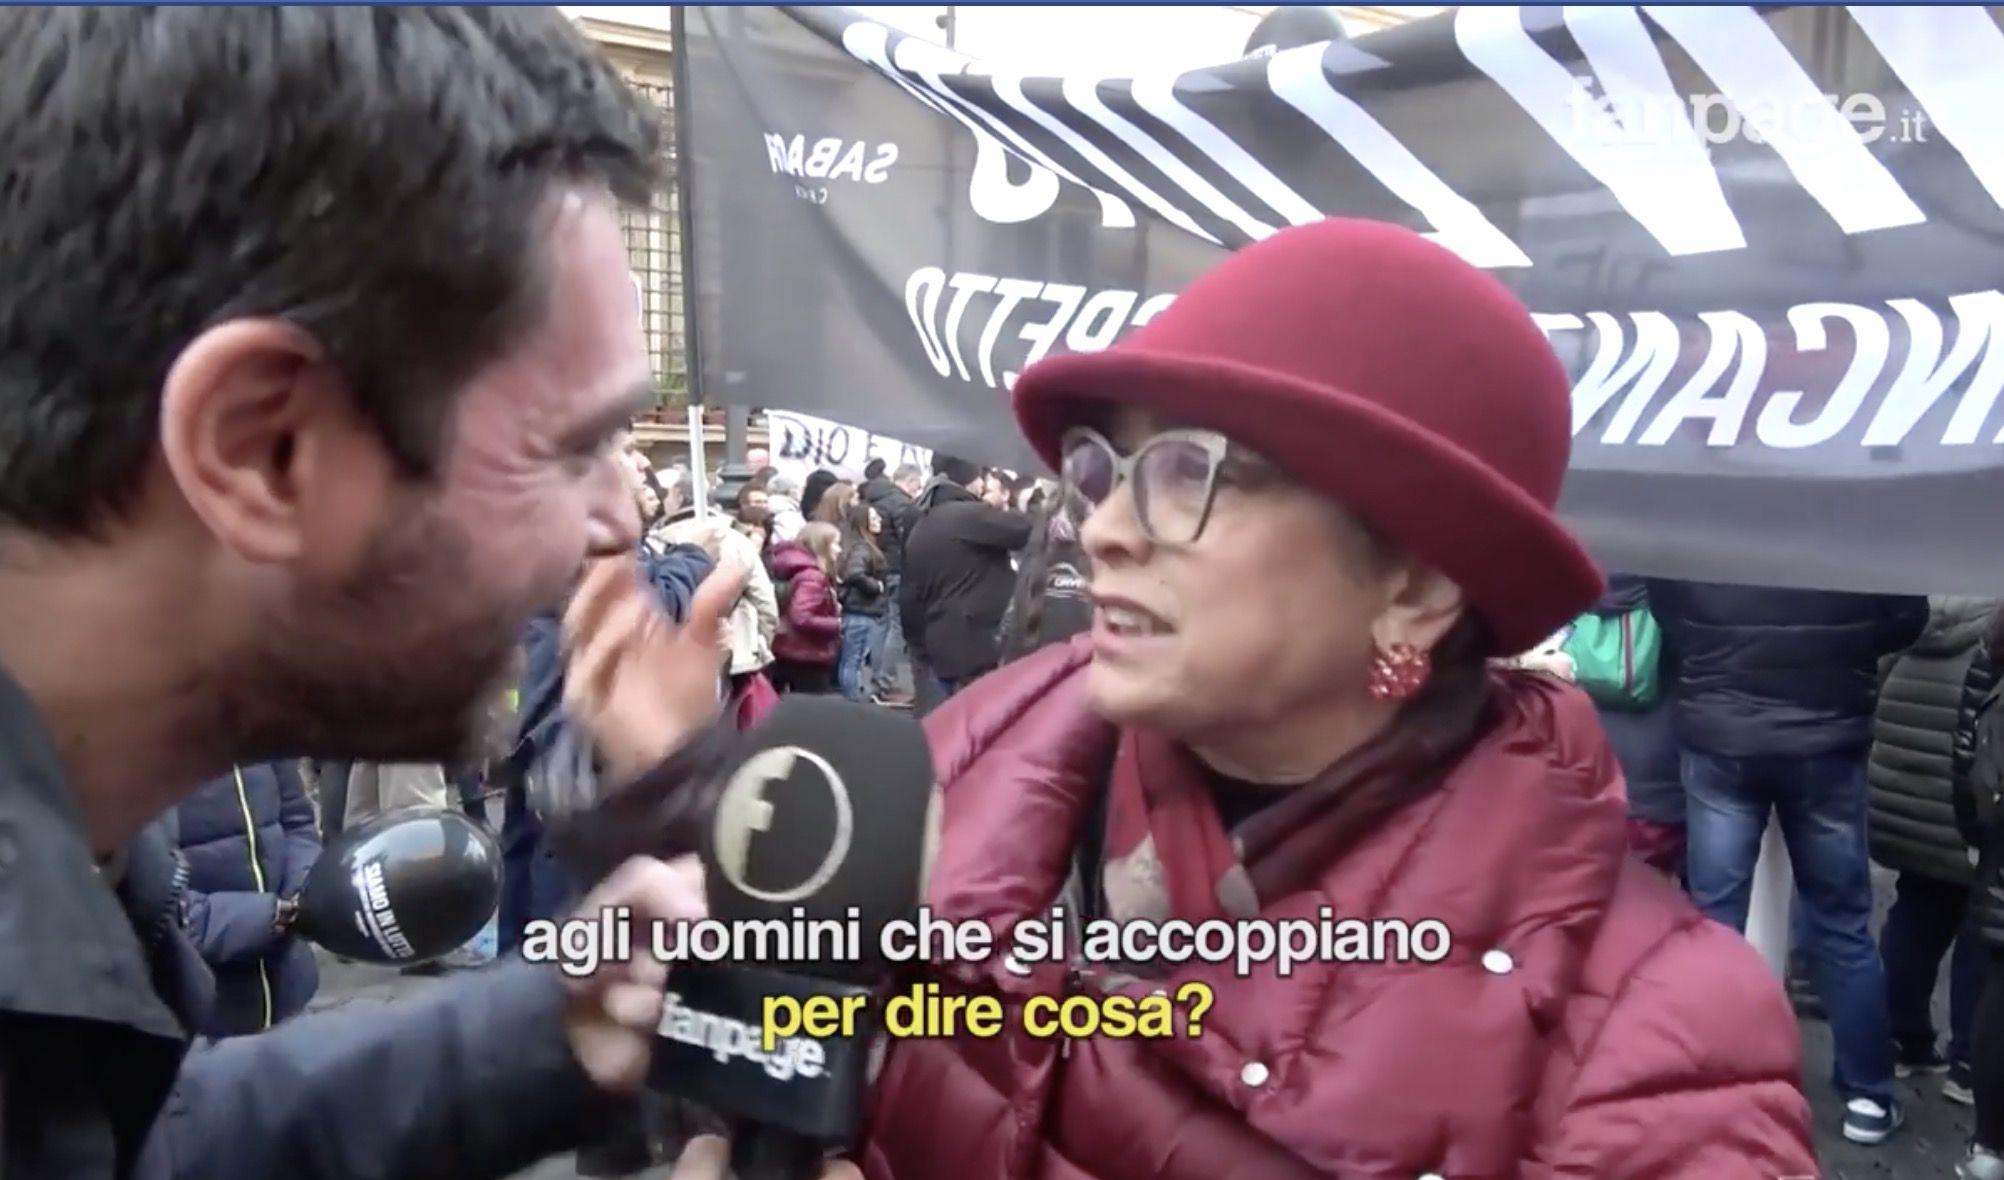 Omofobia-gay-Christian-Dat-Saverio-Tommasi